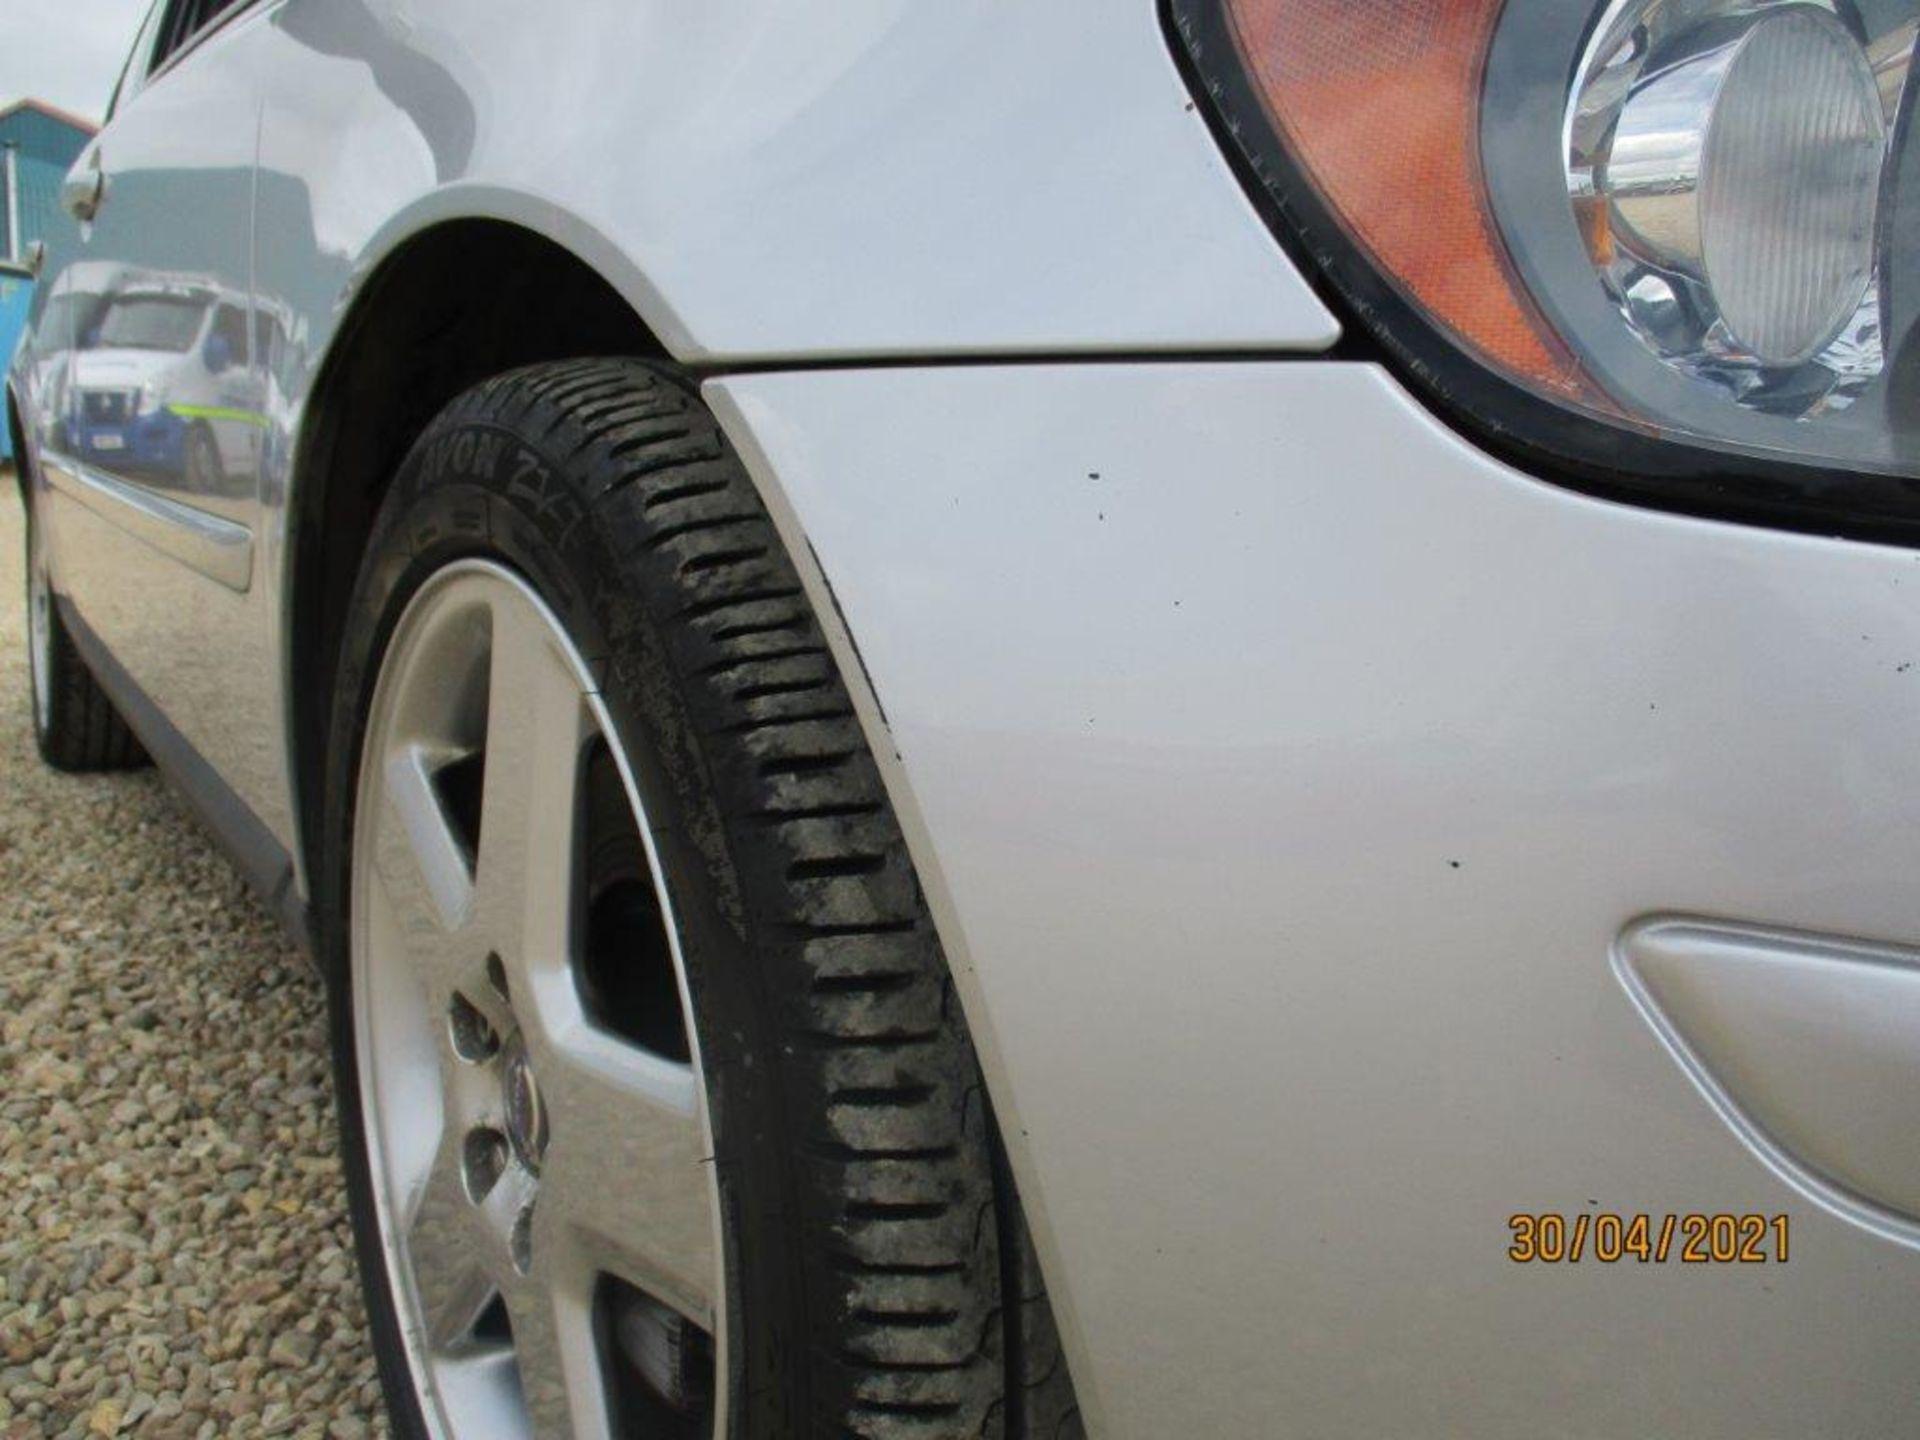 06 06 Volvo V50 SE D (E4) Est - Image 15 of 26